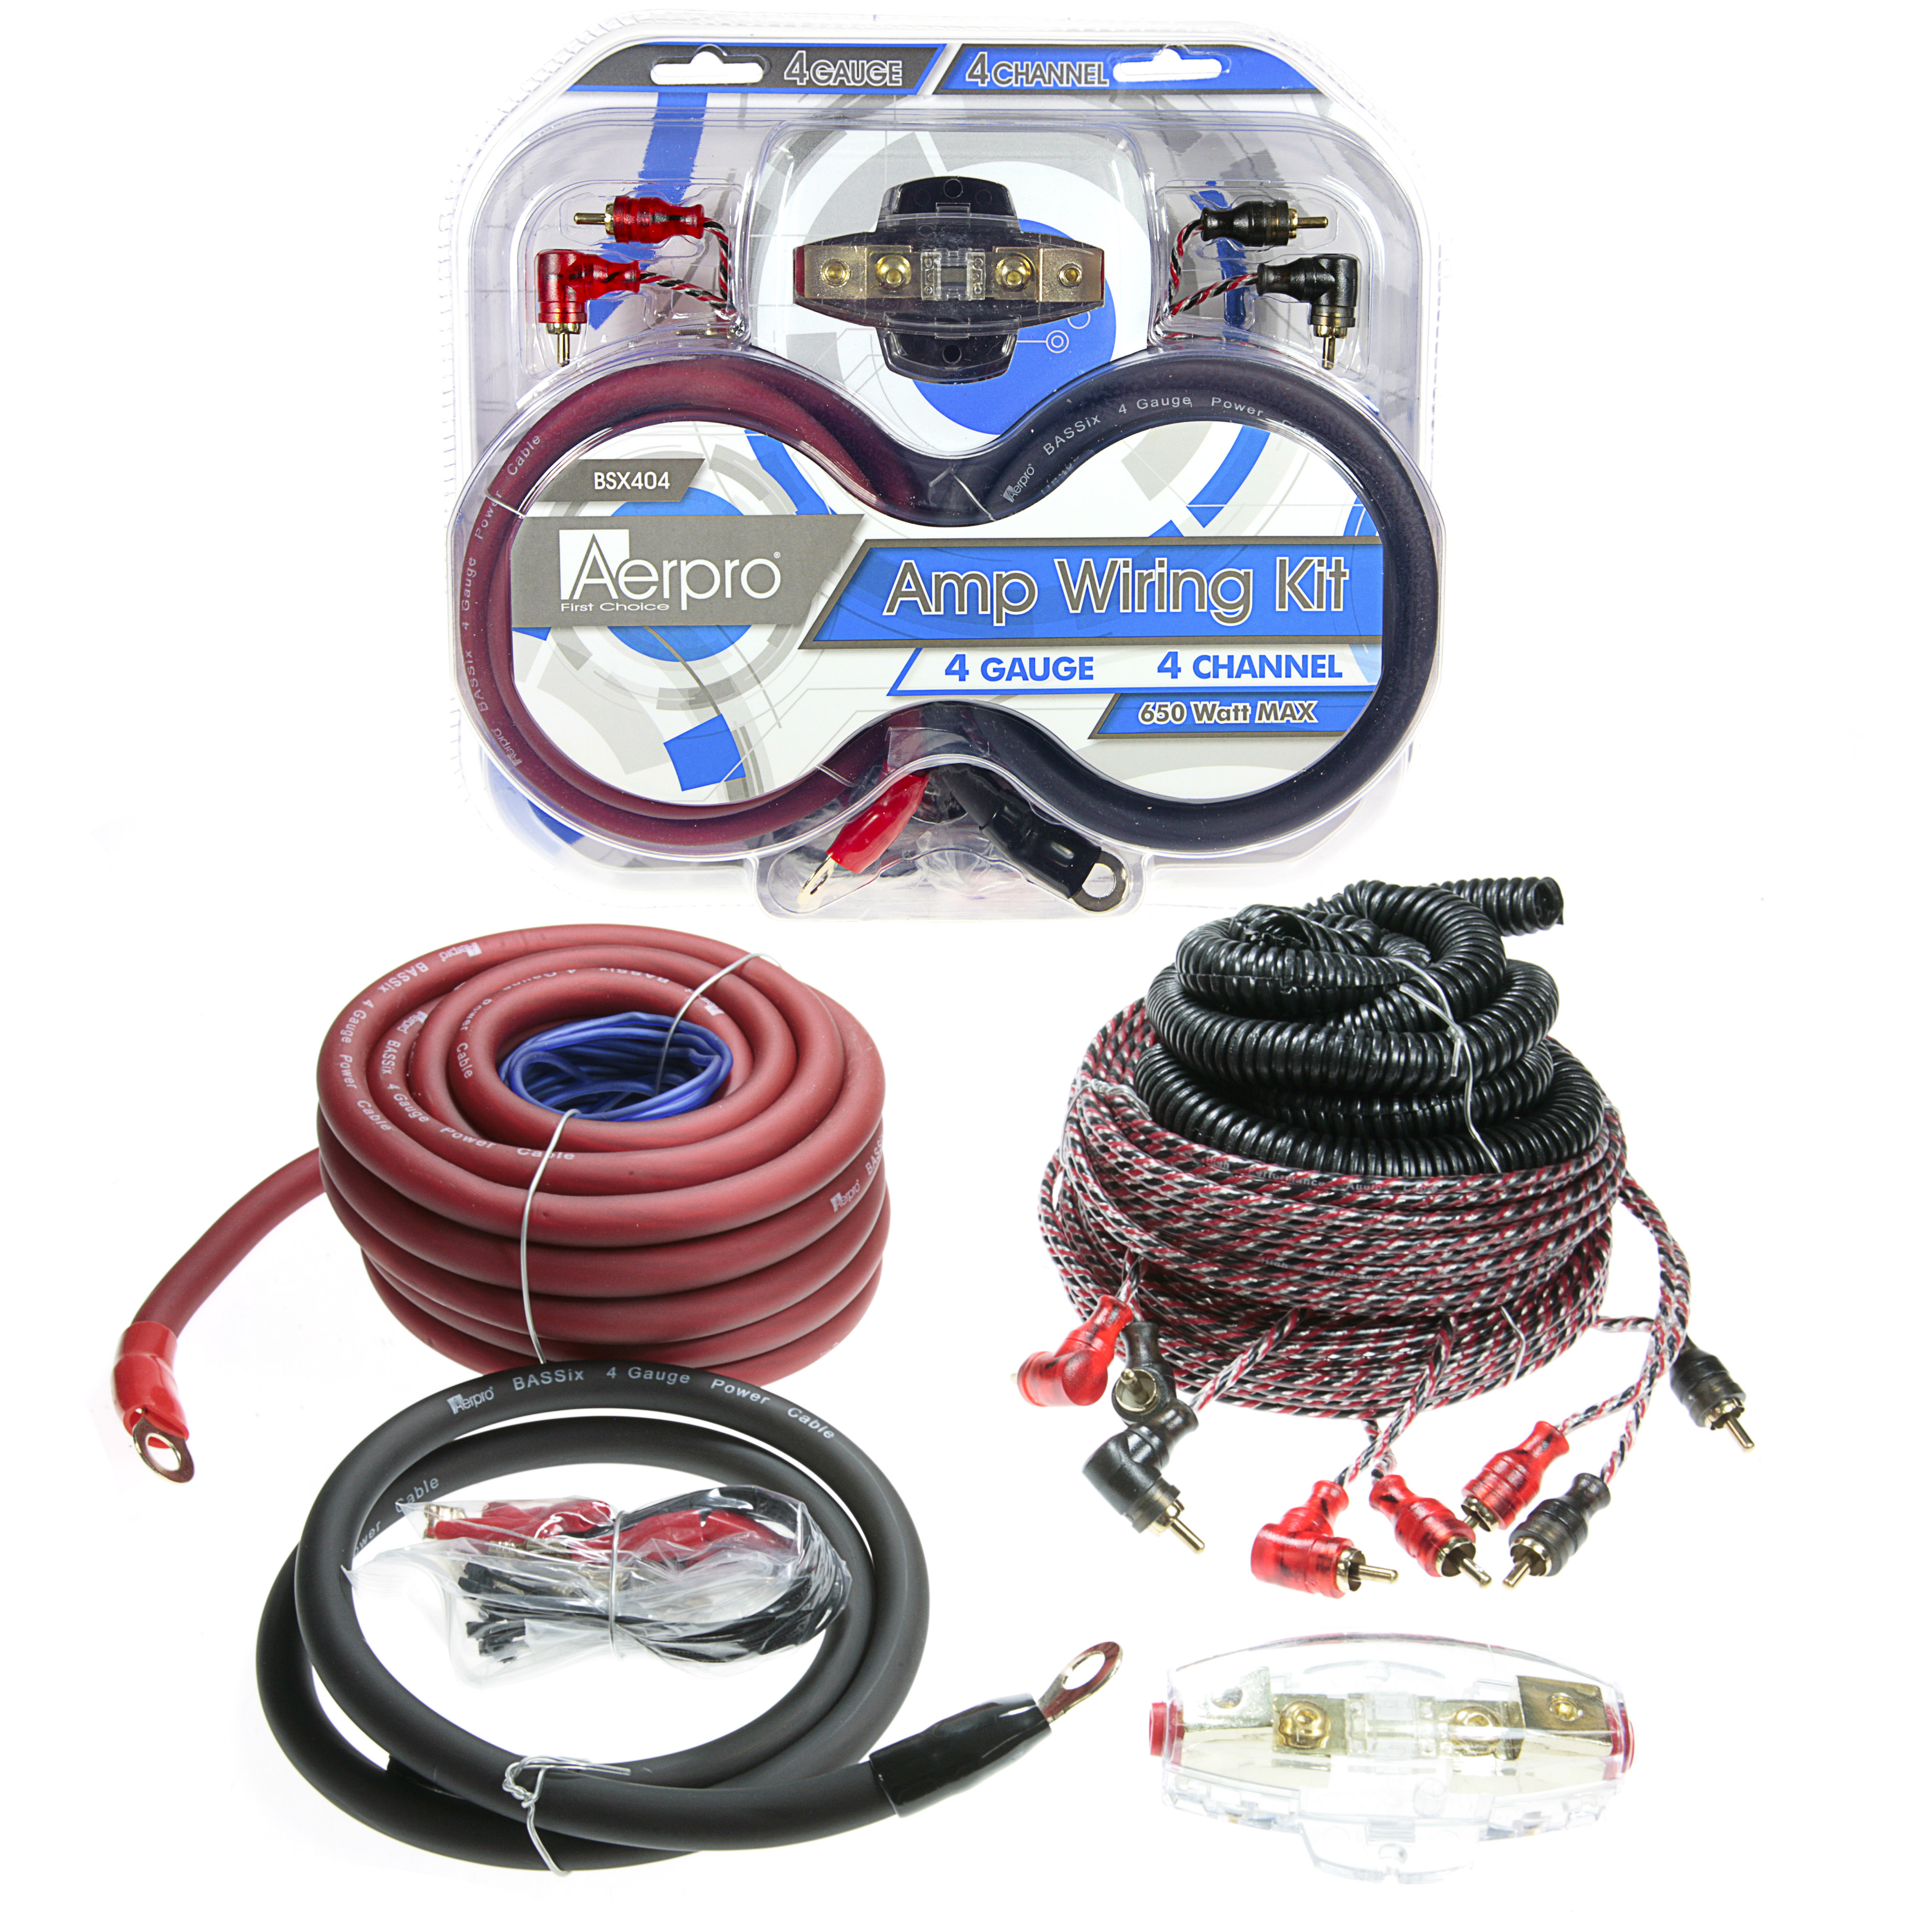 Aerpro First Choice 4 Gauge Amplifier Wiring Kit Bsx404 Bassix 4ga Channel Amp Install